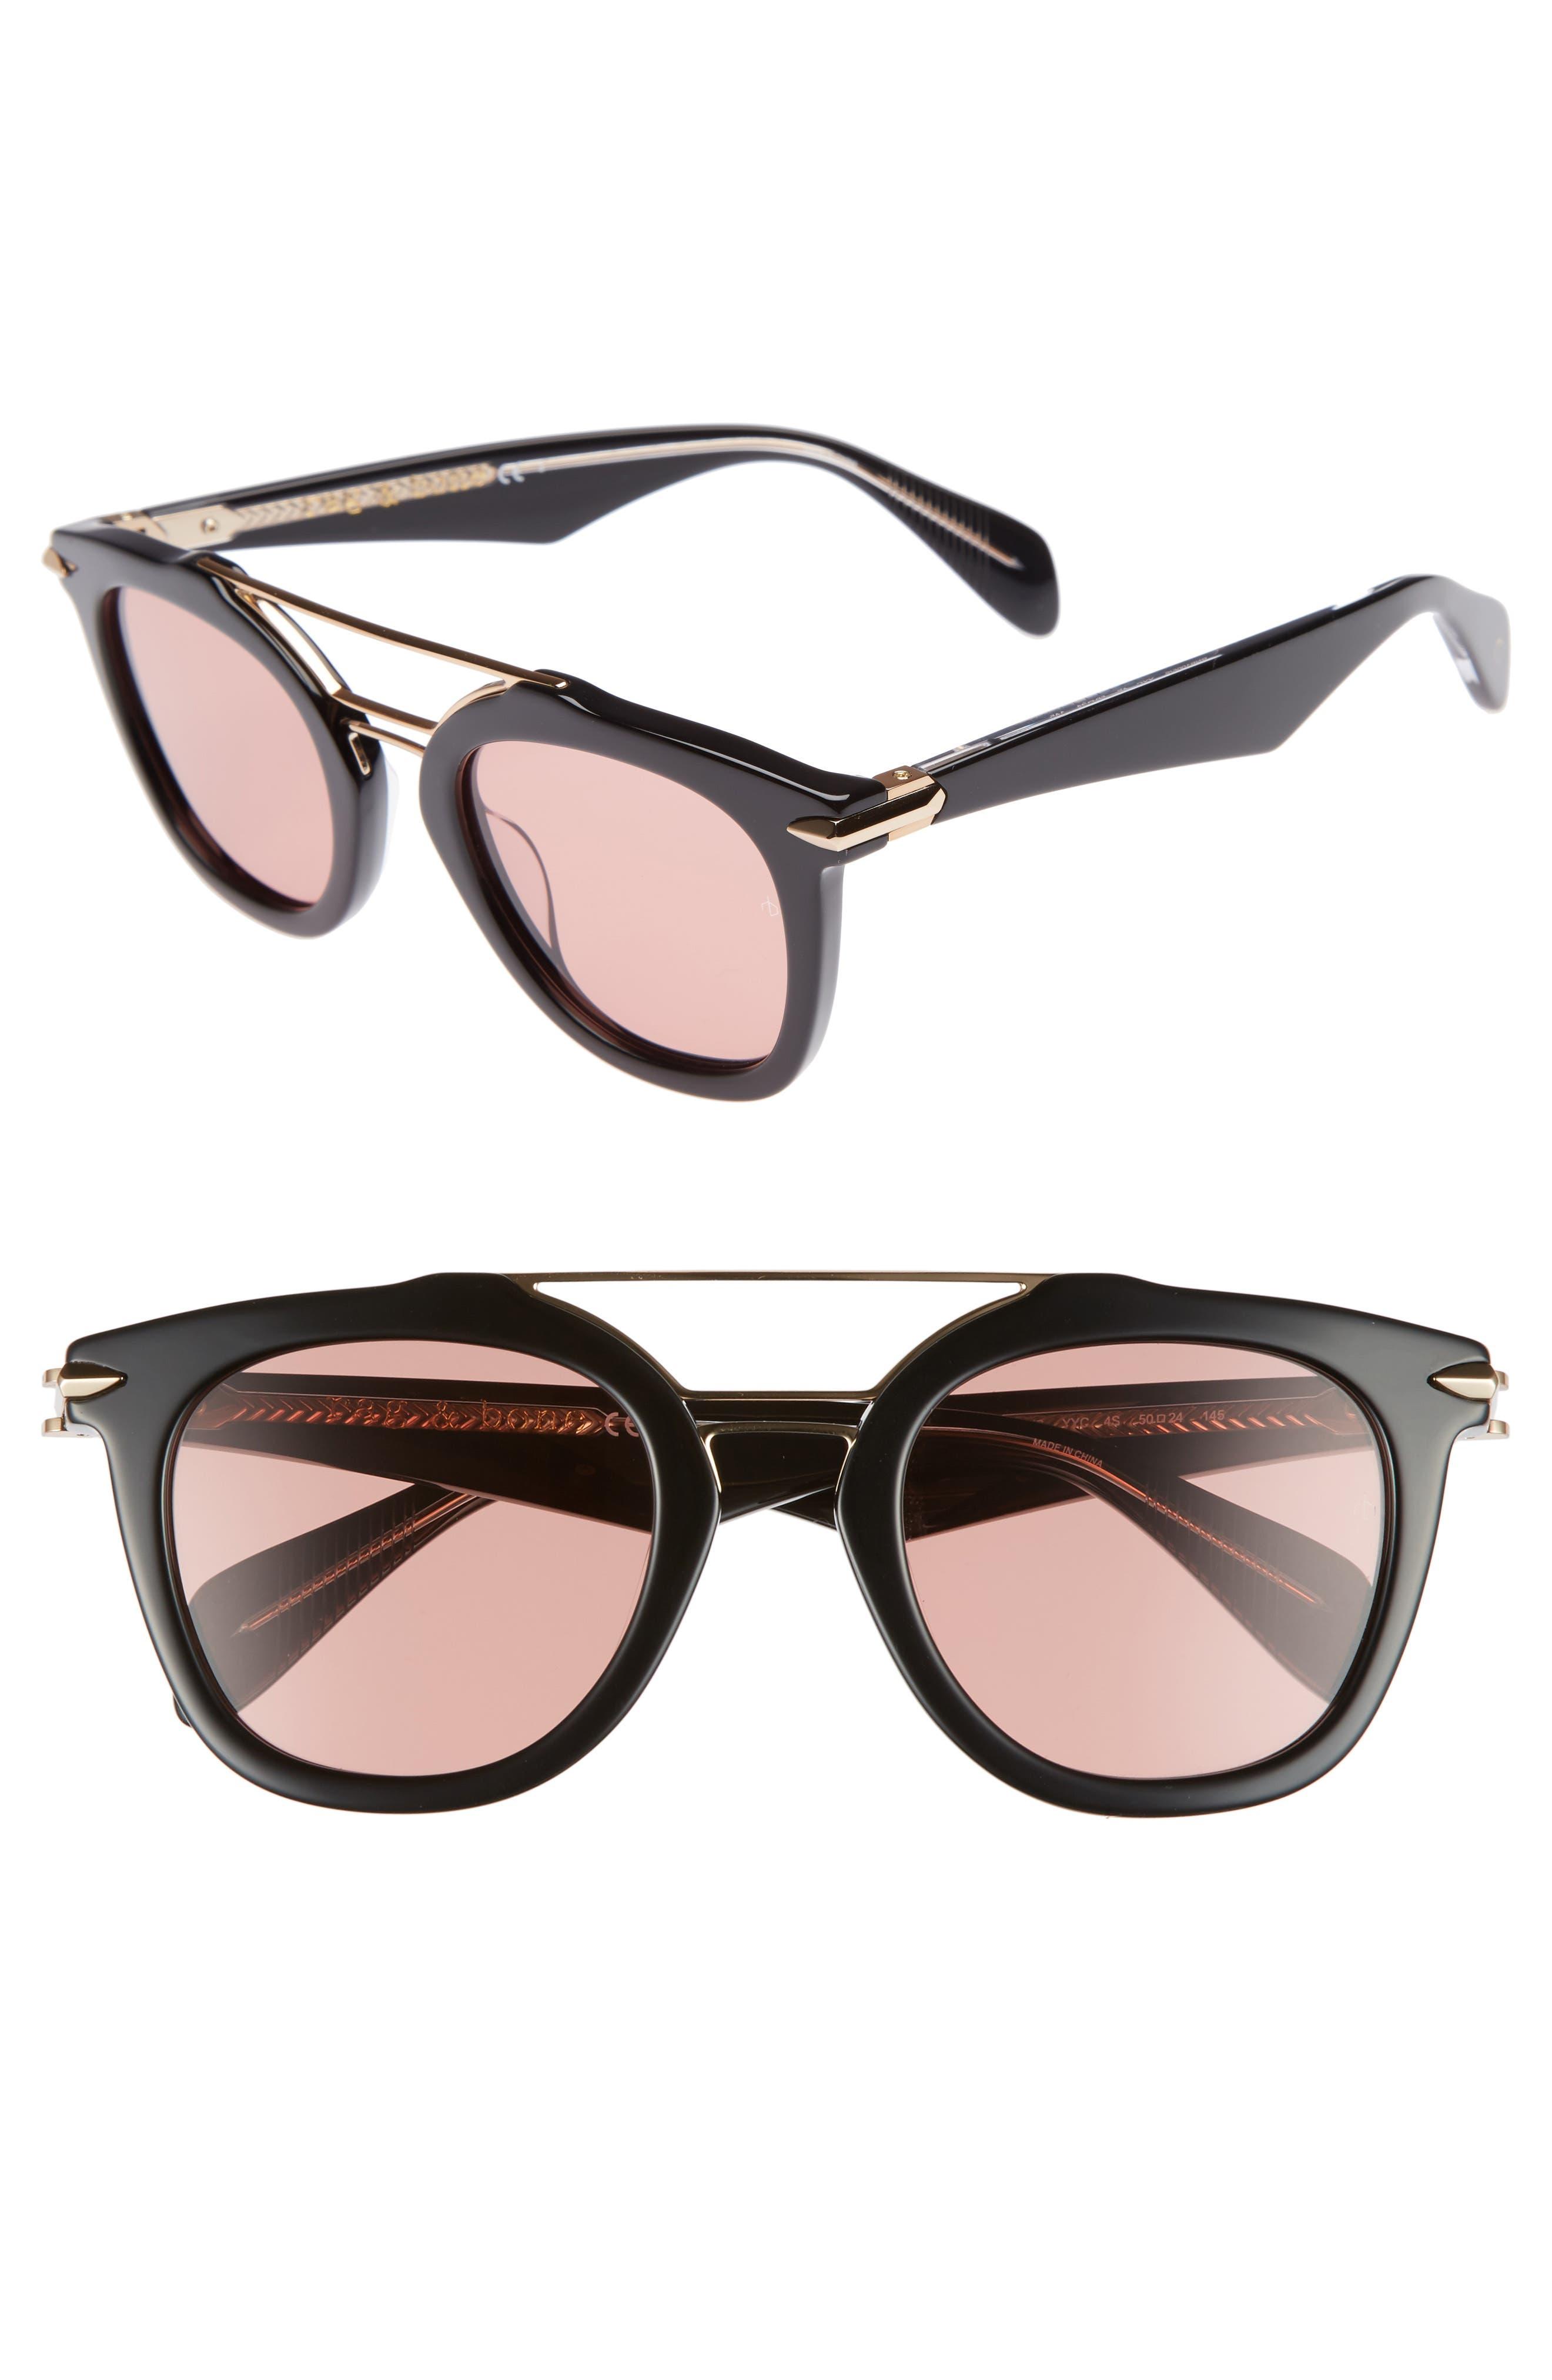 50mm Round Aviator Sunglasses,                         Main,                         color, BLACK/ GOLD/ BRONZE